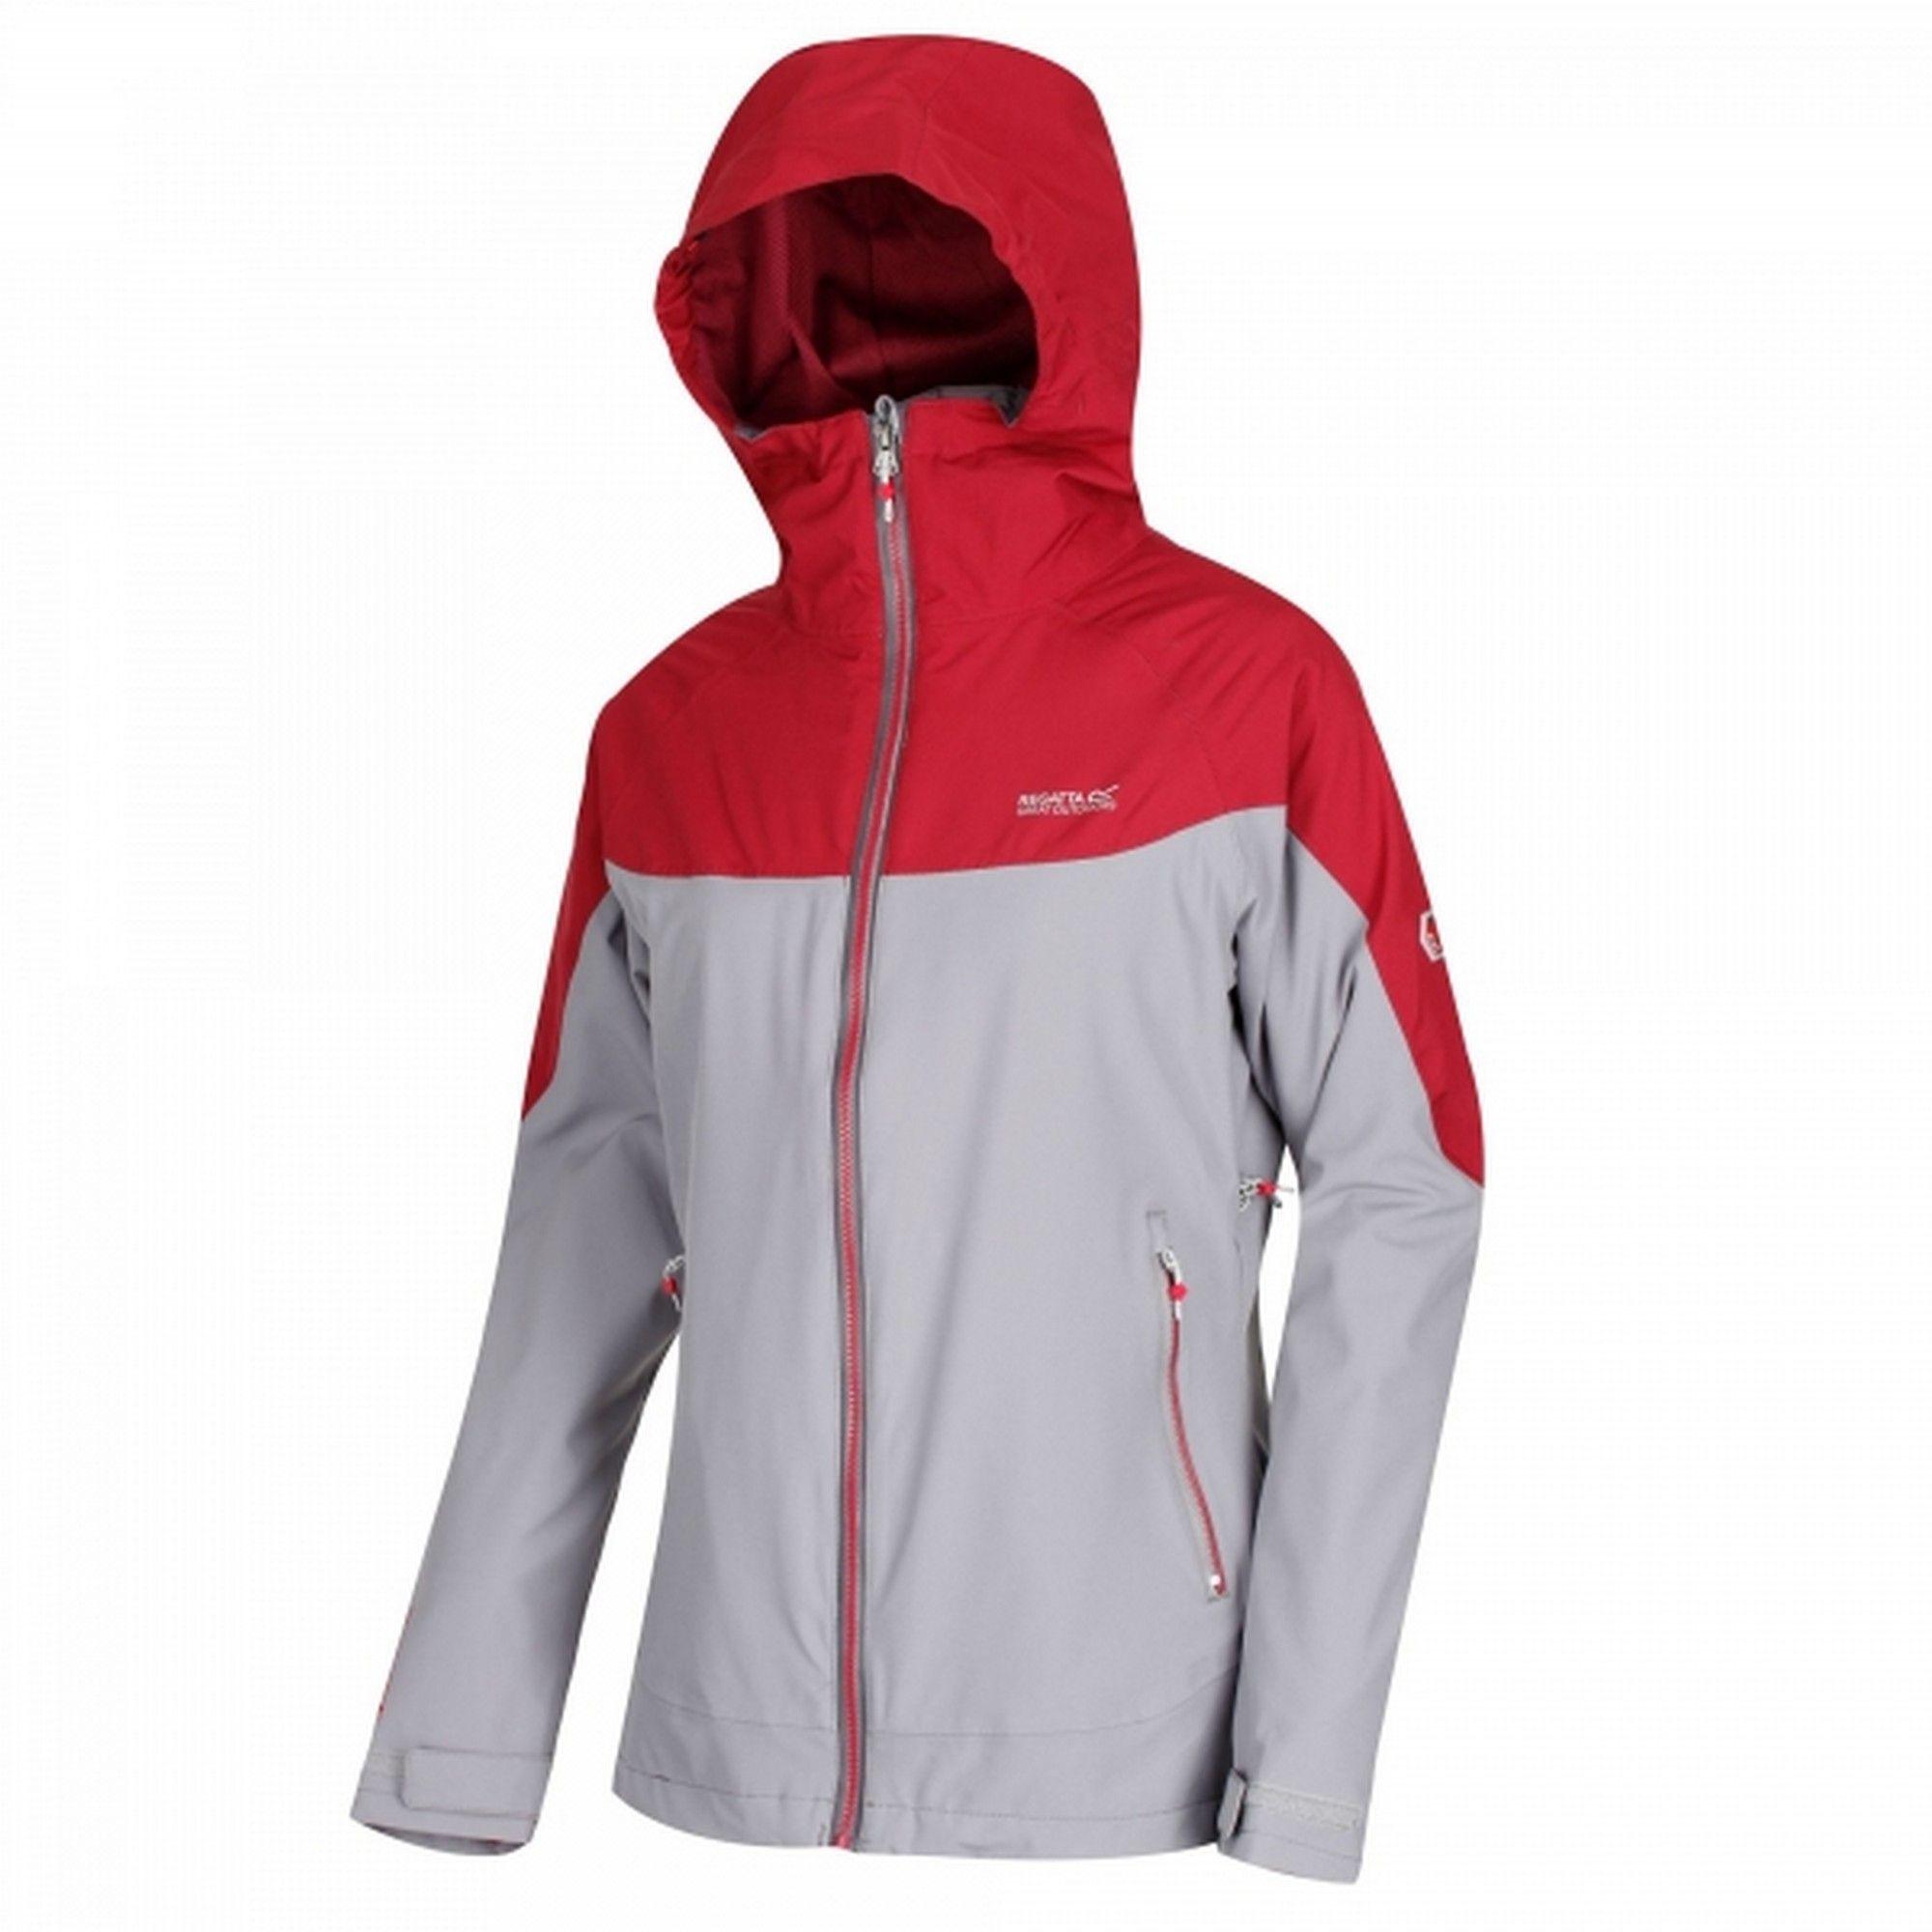 Regatta Womens/Ladies Wentwood III Hooded Jacket (Papyrus White/Raspberry Red)